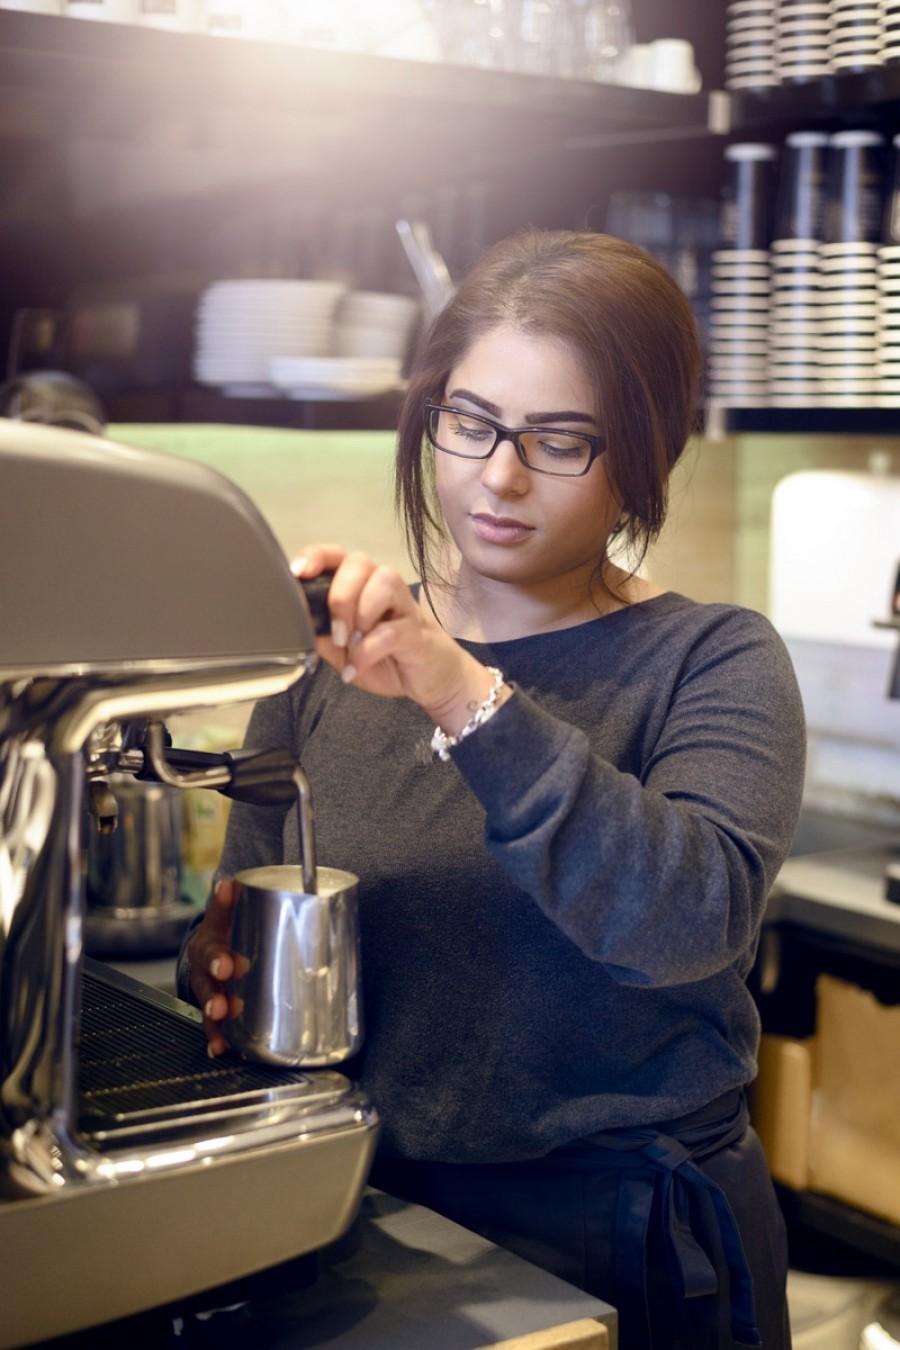 A young barista makes a coffee